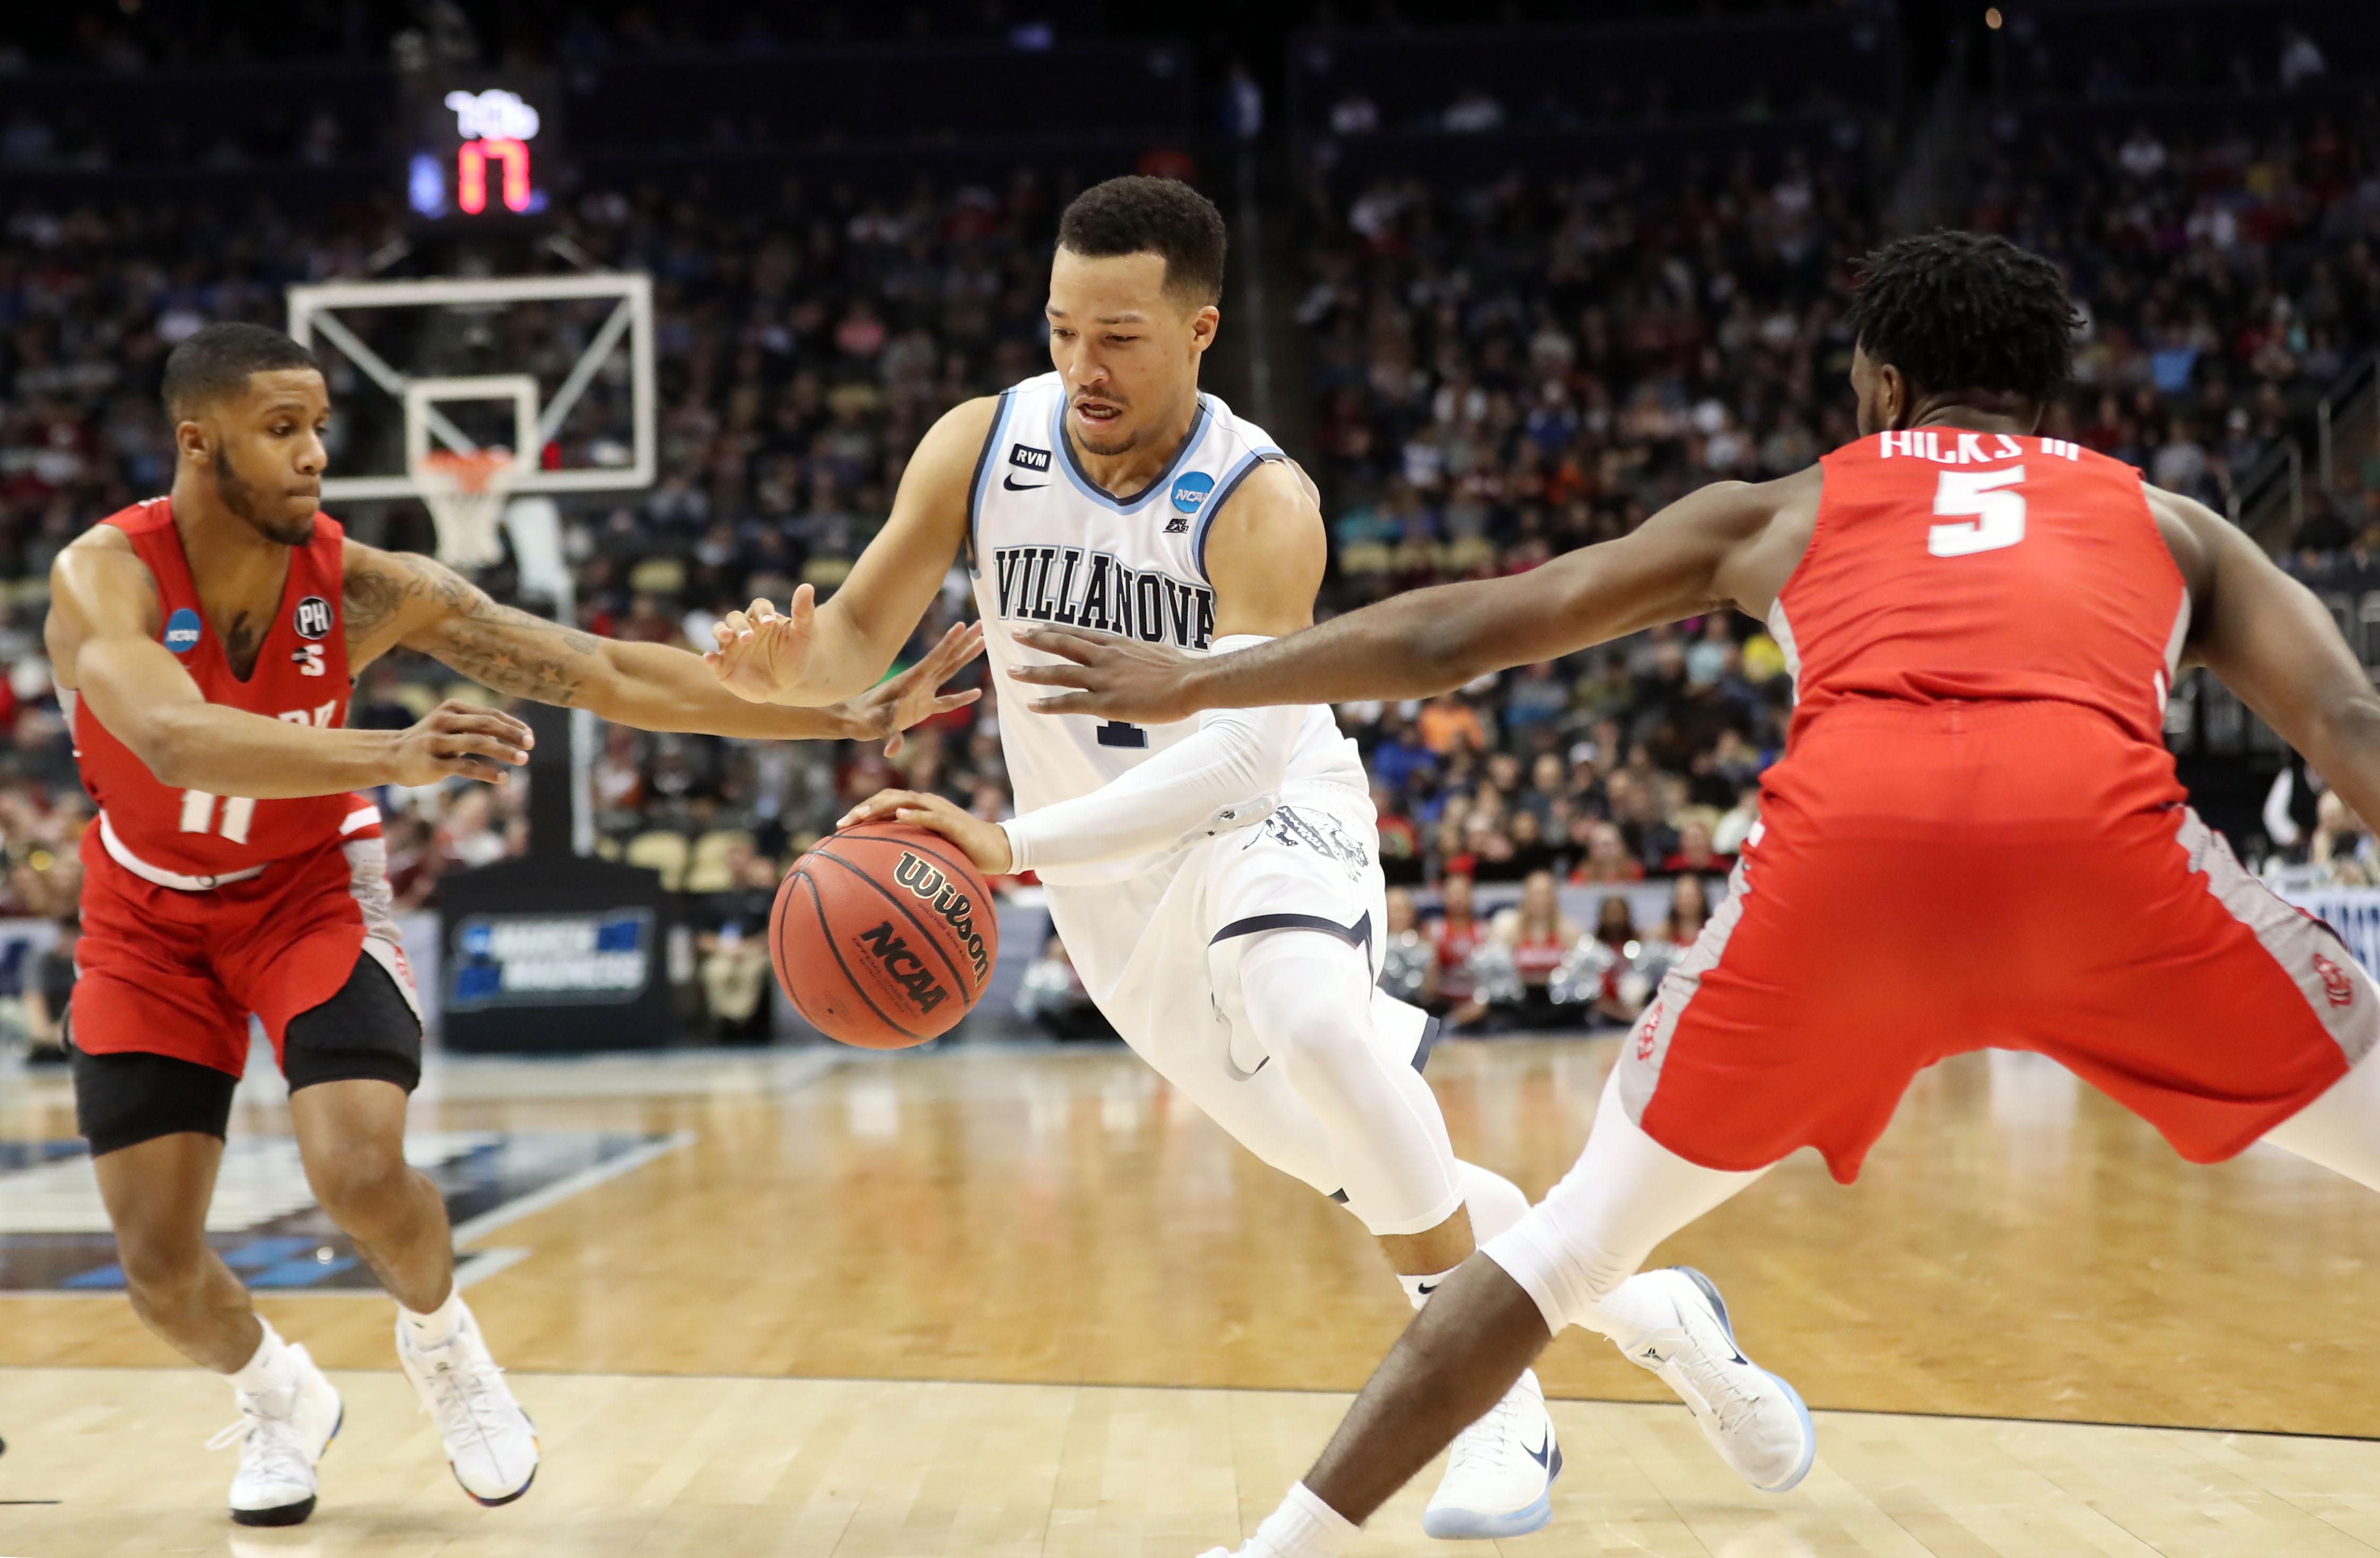 NCAA Basketball: NCAA Tournament-First Round-Villanova vs Radford